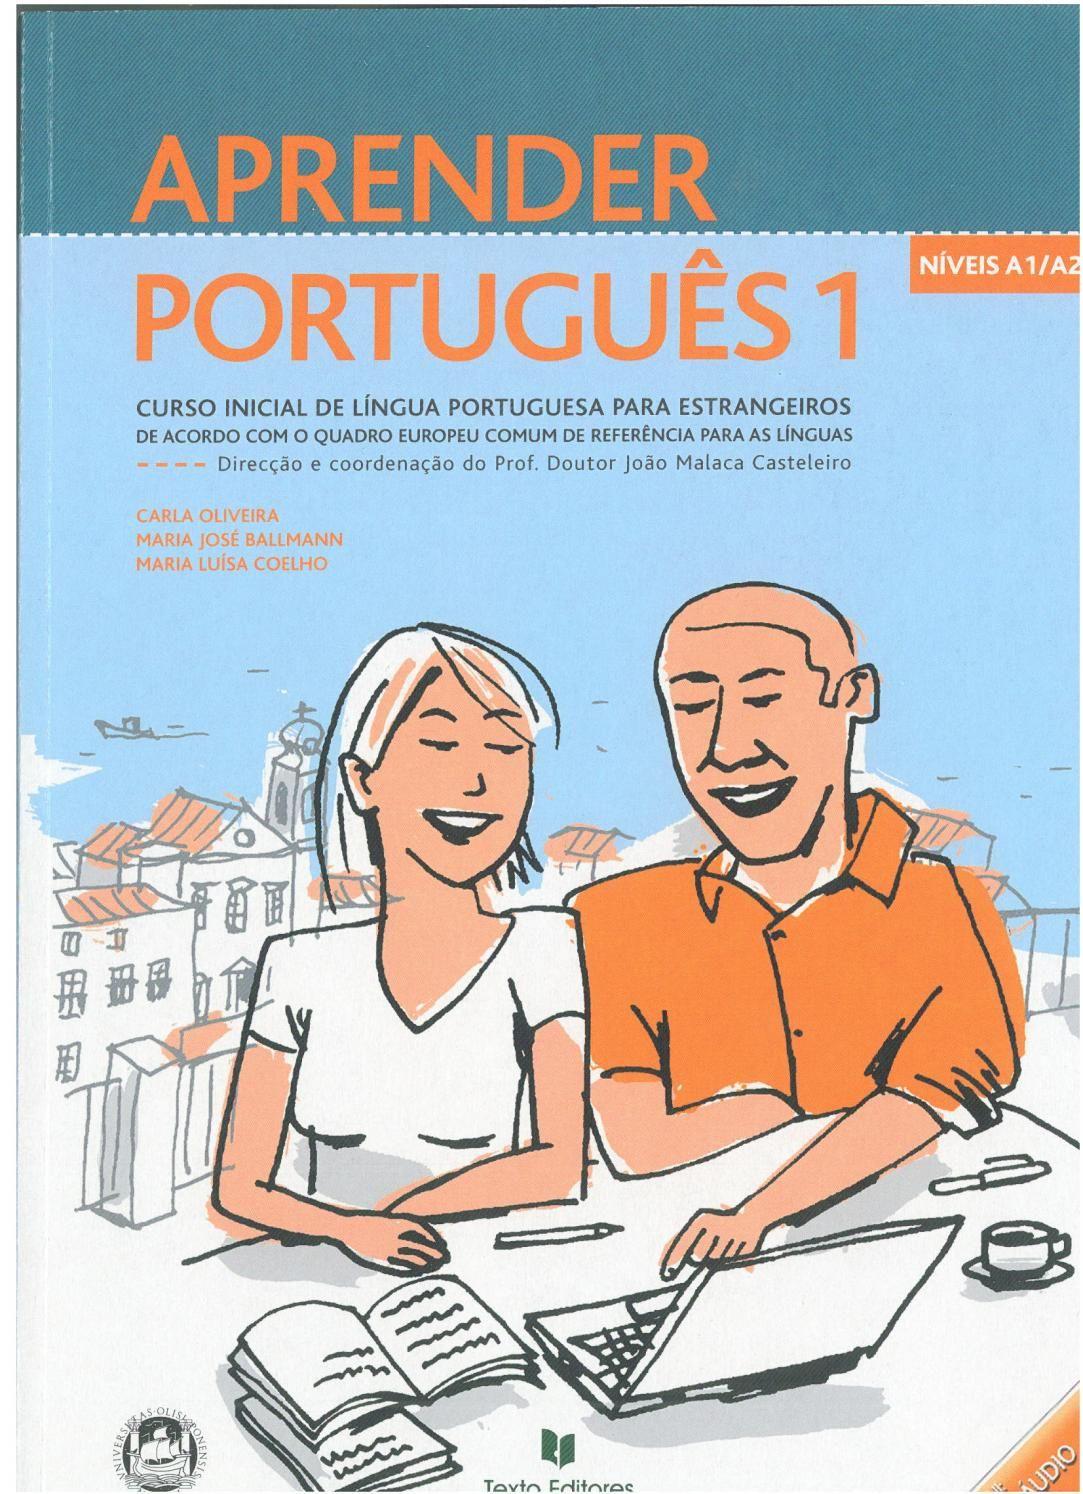 15442506 Aprender Portugues 1 Portuguese Lessons Learn Portuguese Portuguese Language